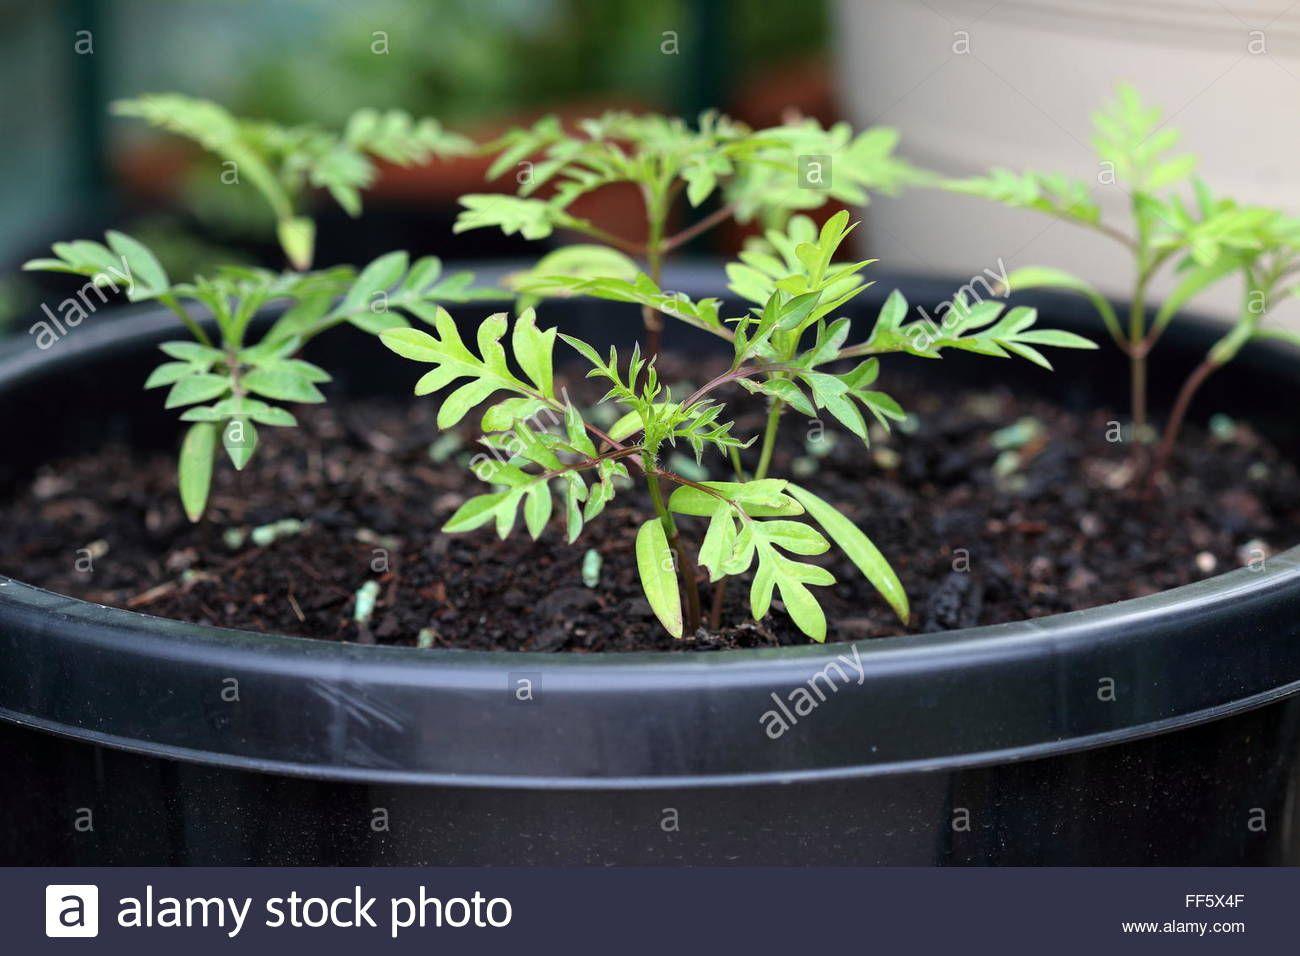 cosmos seedlings stock photos